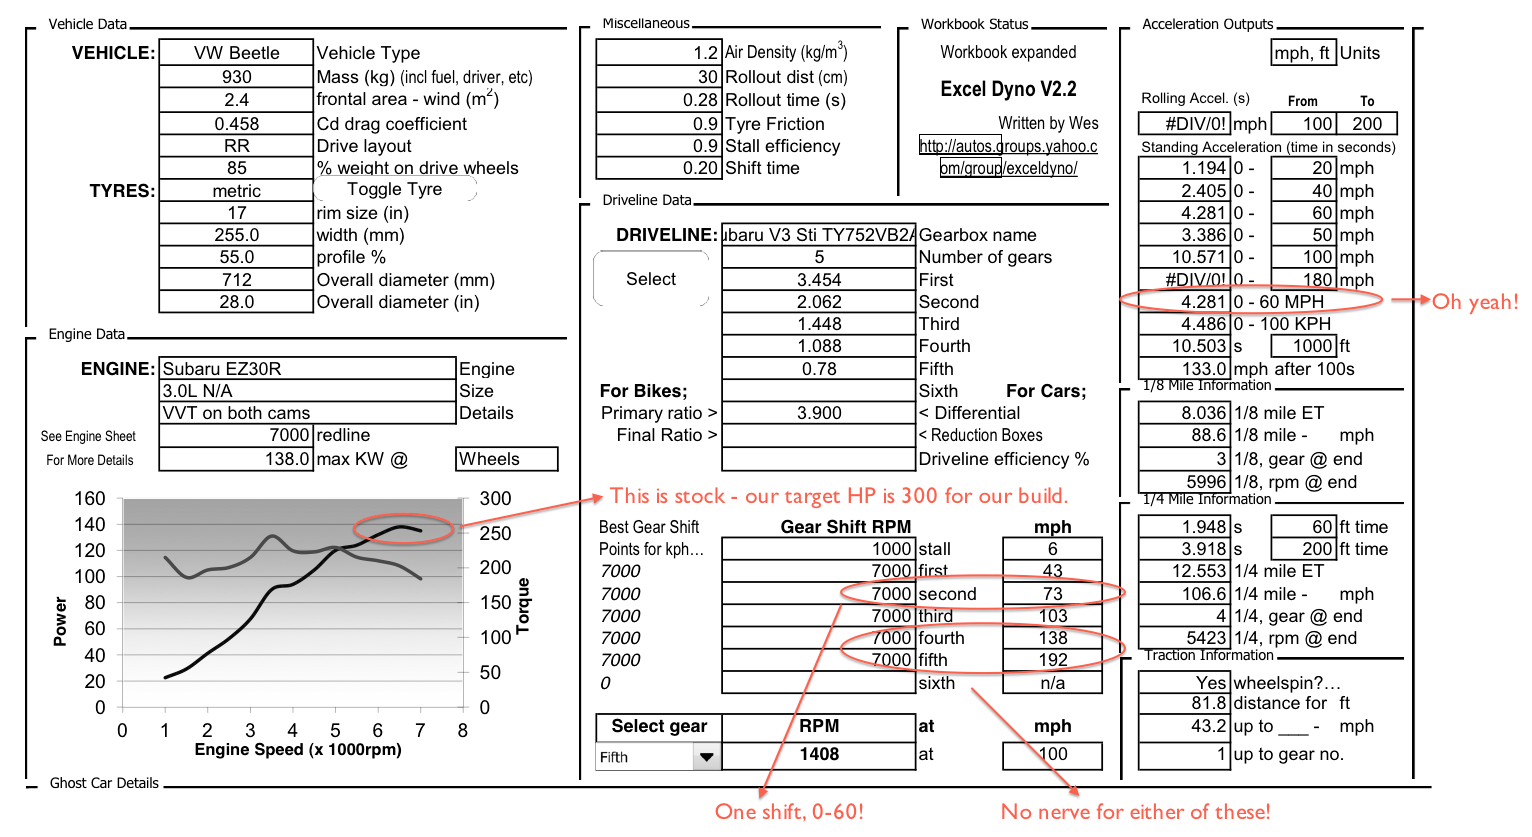 Subaru Transaxle Charting